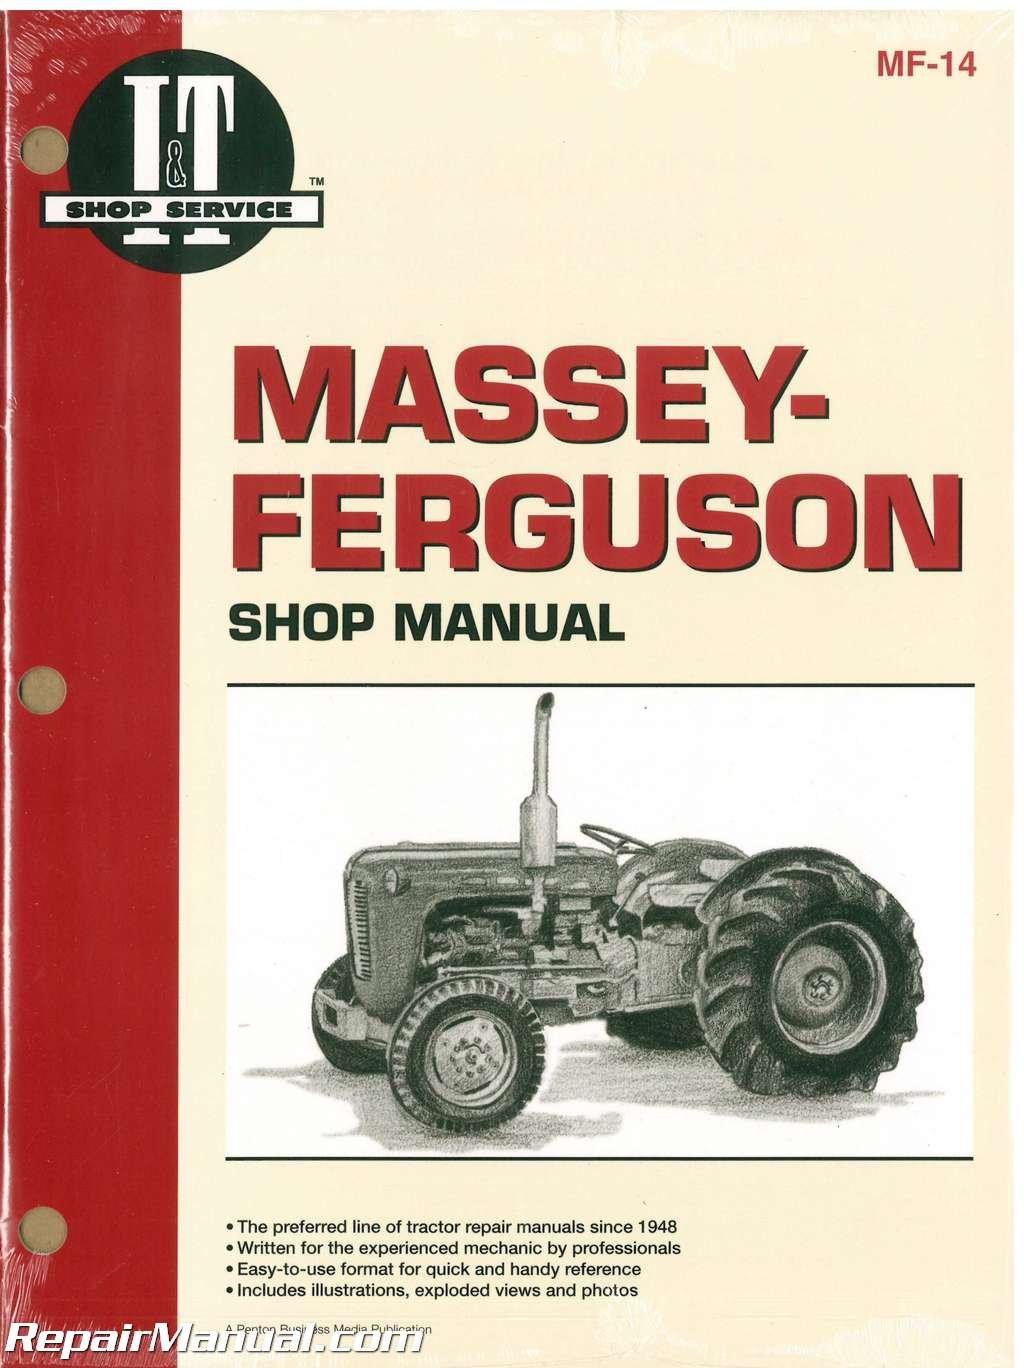 MF-14 Massey-Ferguson F40, MF202, MF204, MF35, MF35 Diesel, MF50, MH50,  MHF202, TO35, TO35 Diesel Tractor Workshop Manual: Manufacturer:  Amazon.com: Books